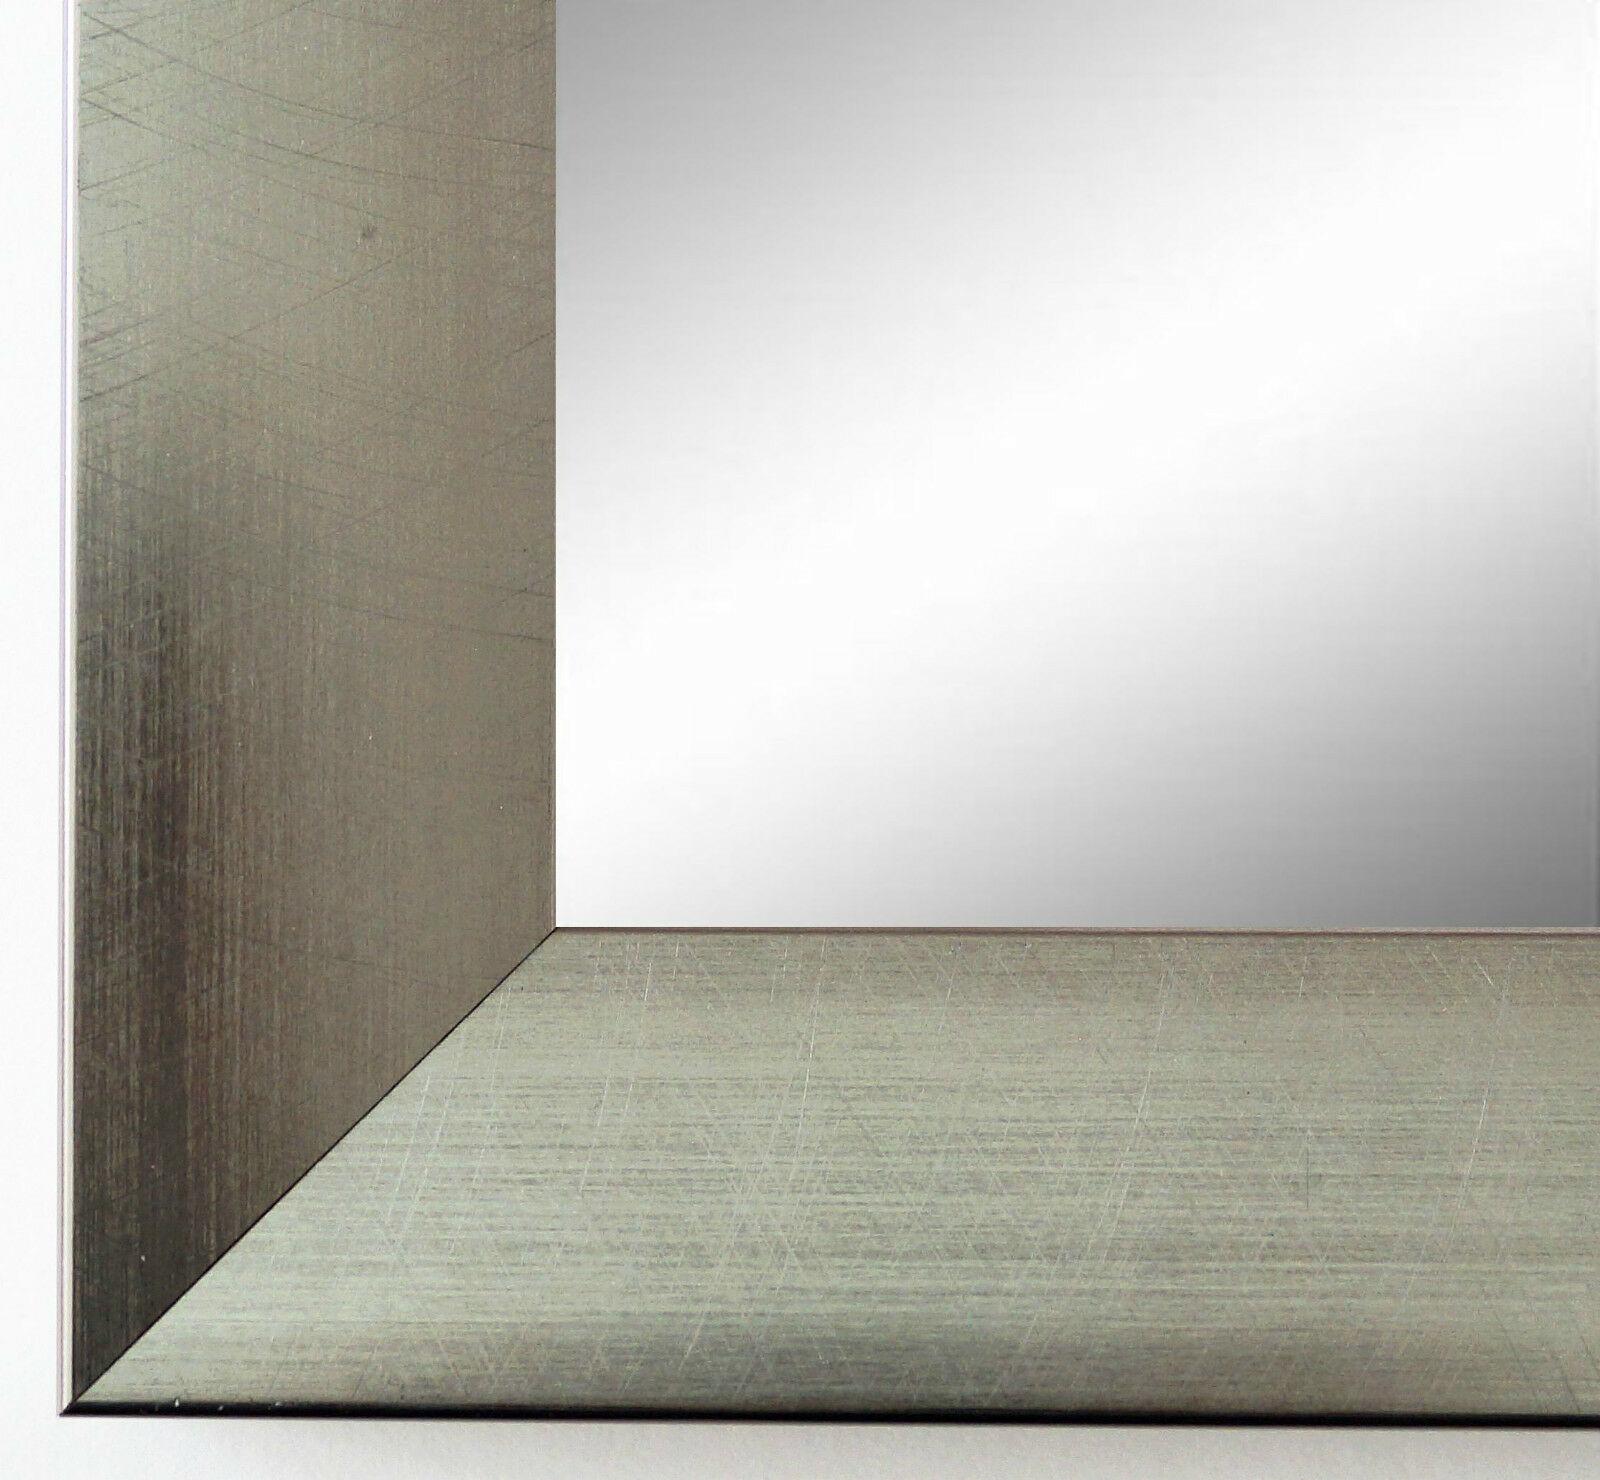 Wandspiegel Silber Modern wandspiegel silber spiegel modern badspiegel flur garderobe bergamo